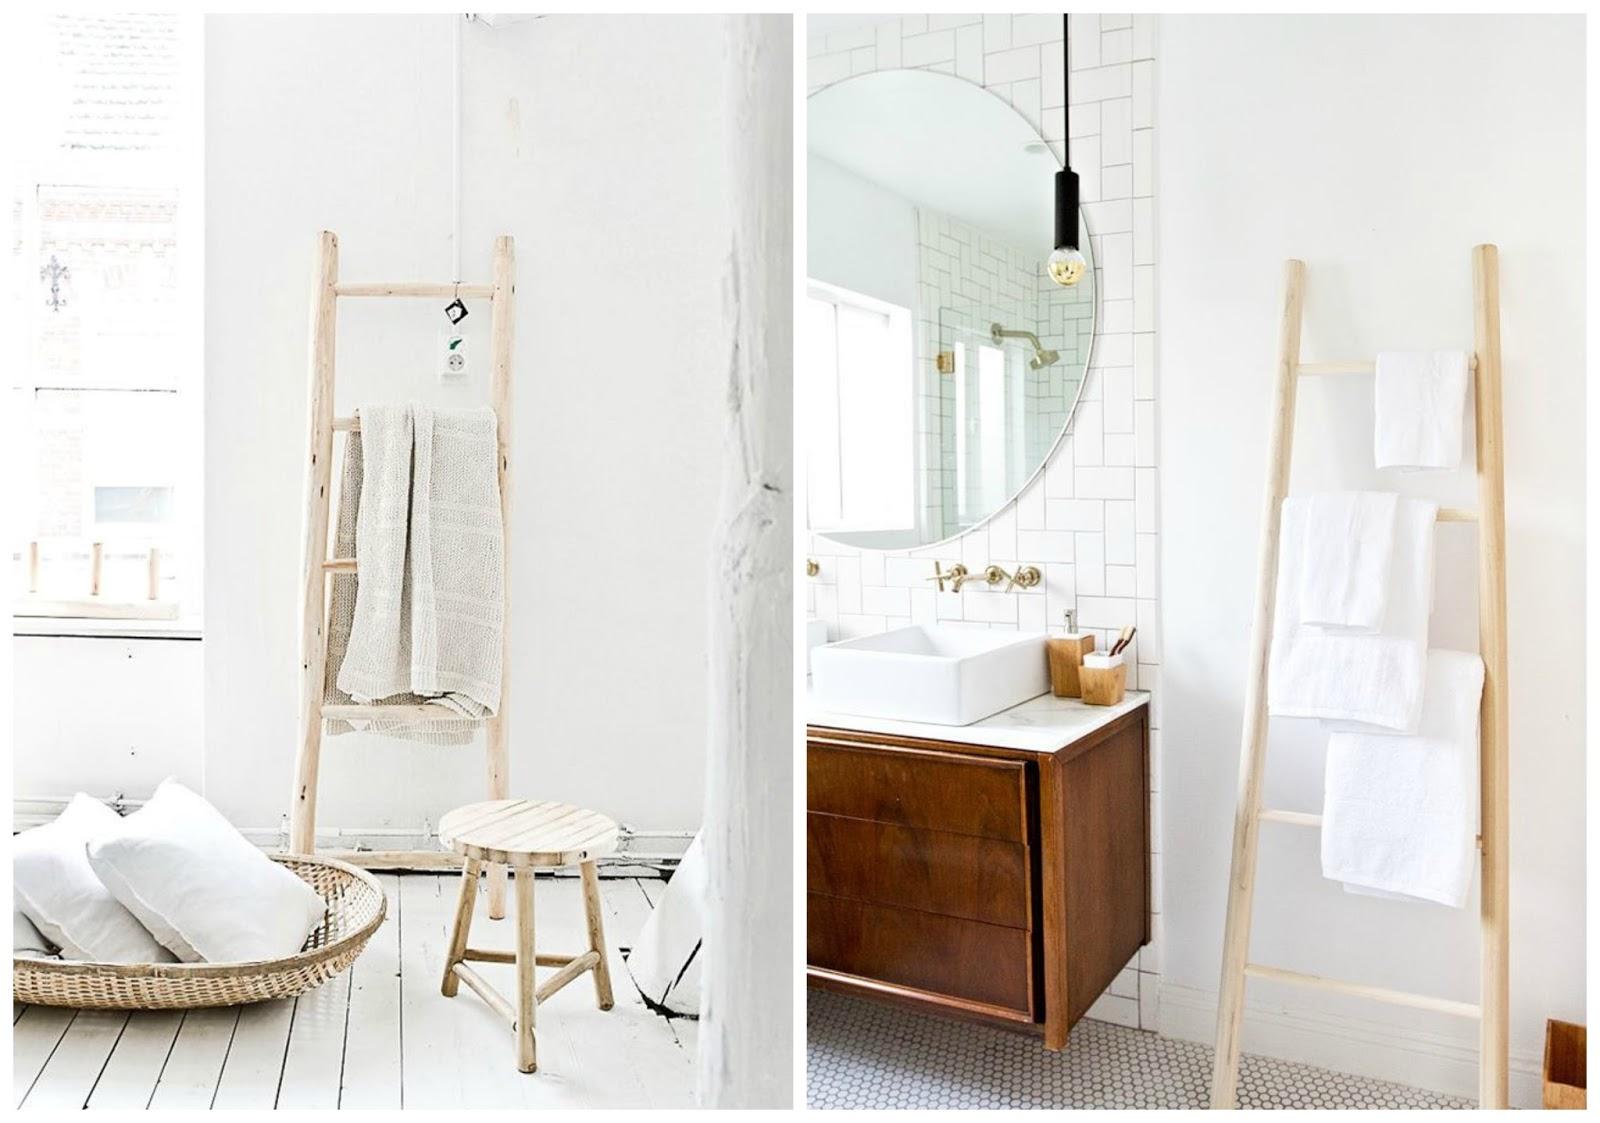 Escalera toallero zara home affordable dormitorio with escalera toallero zara home stunning - Escalera decorativa zara home ...